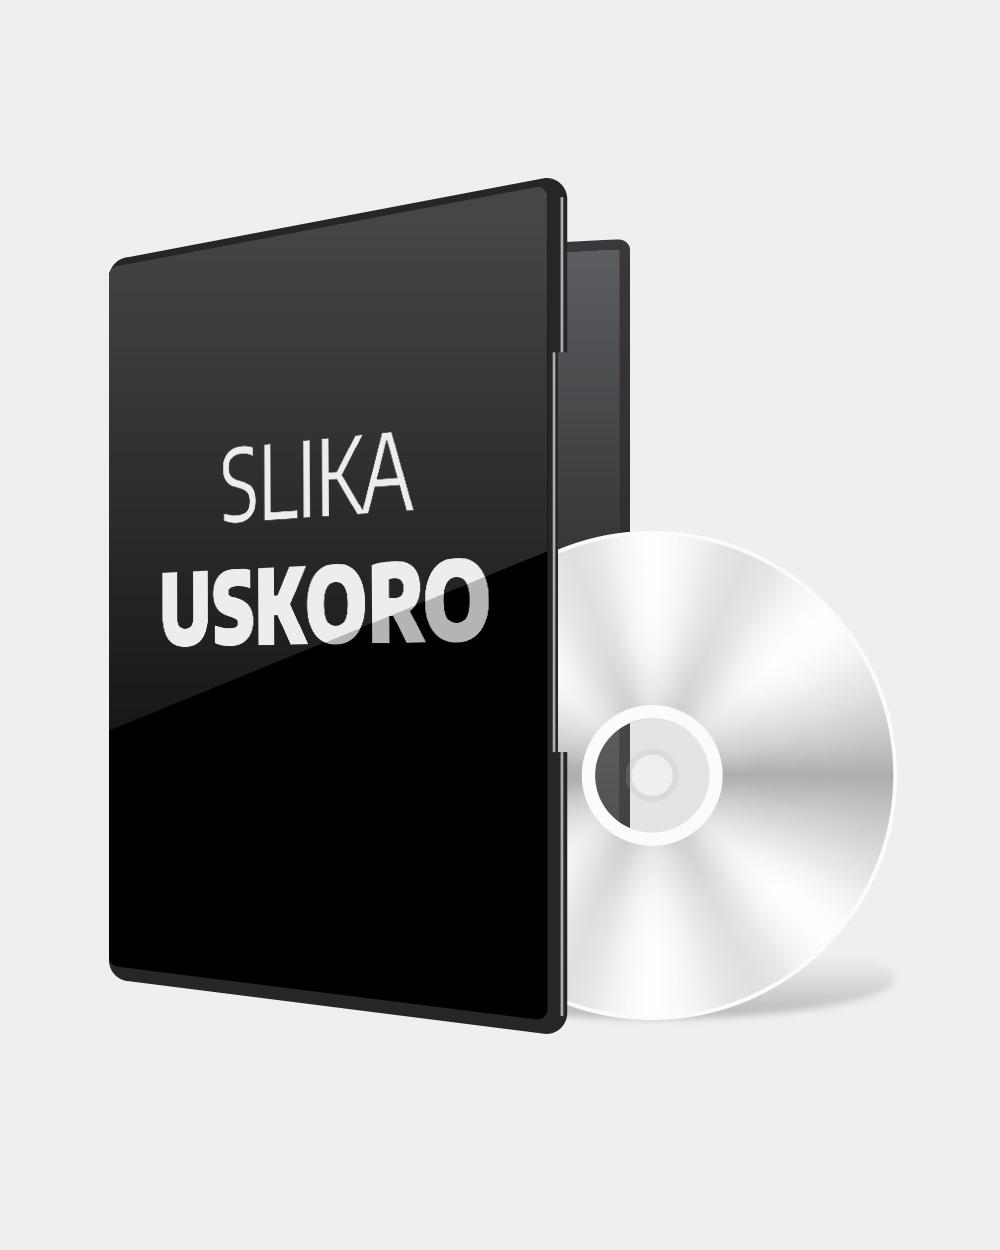 Gejmerska stolica Playseat® F1 Aston Martin Red Bull Racing